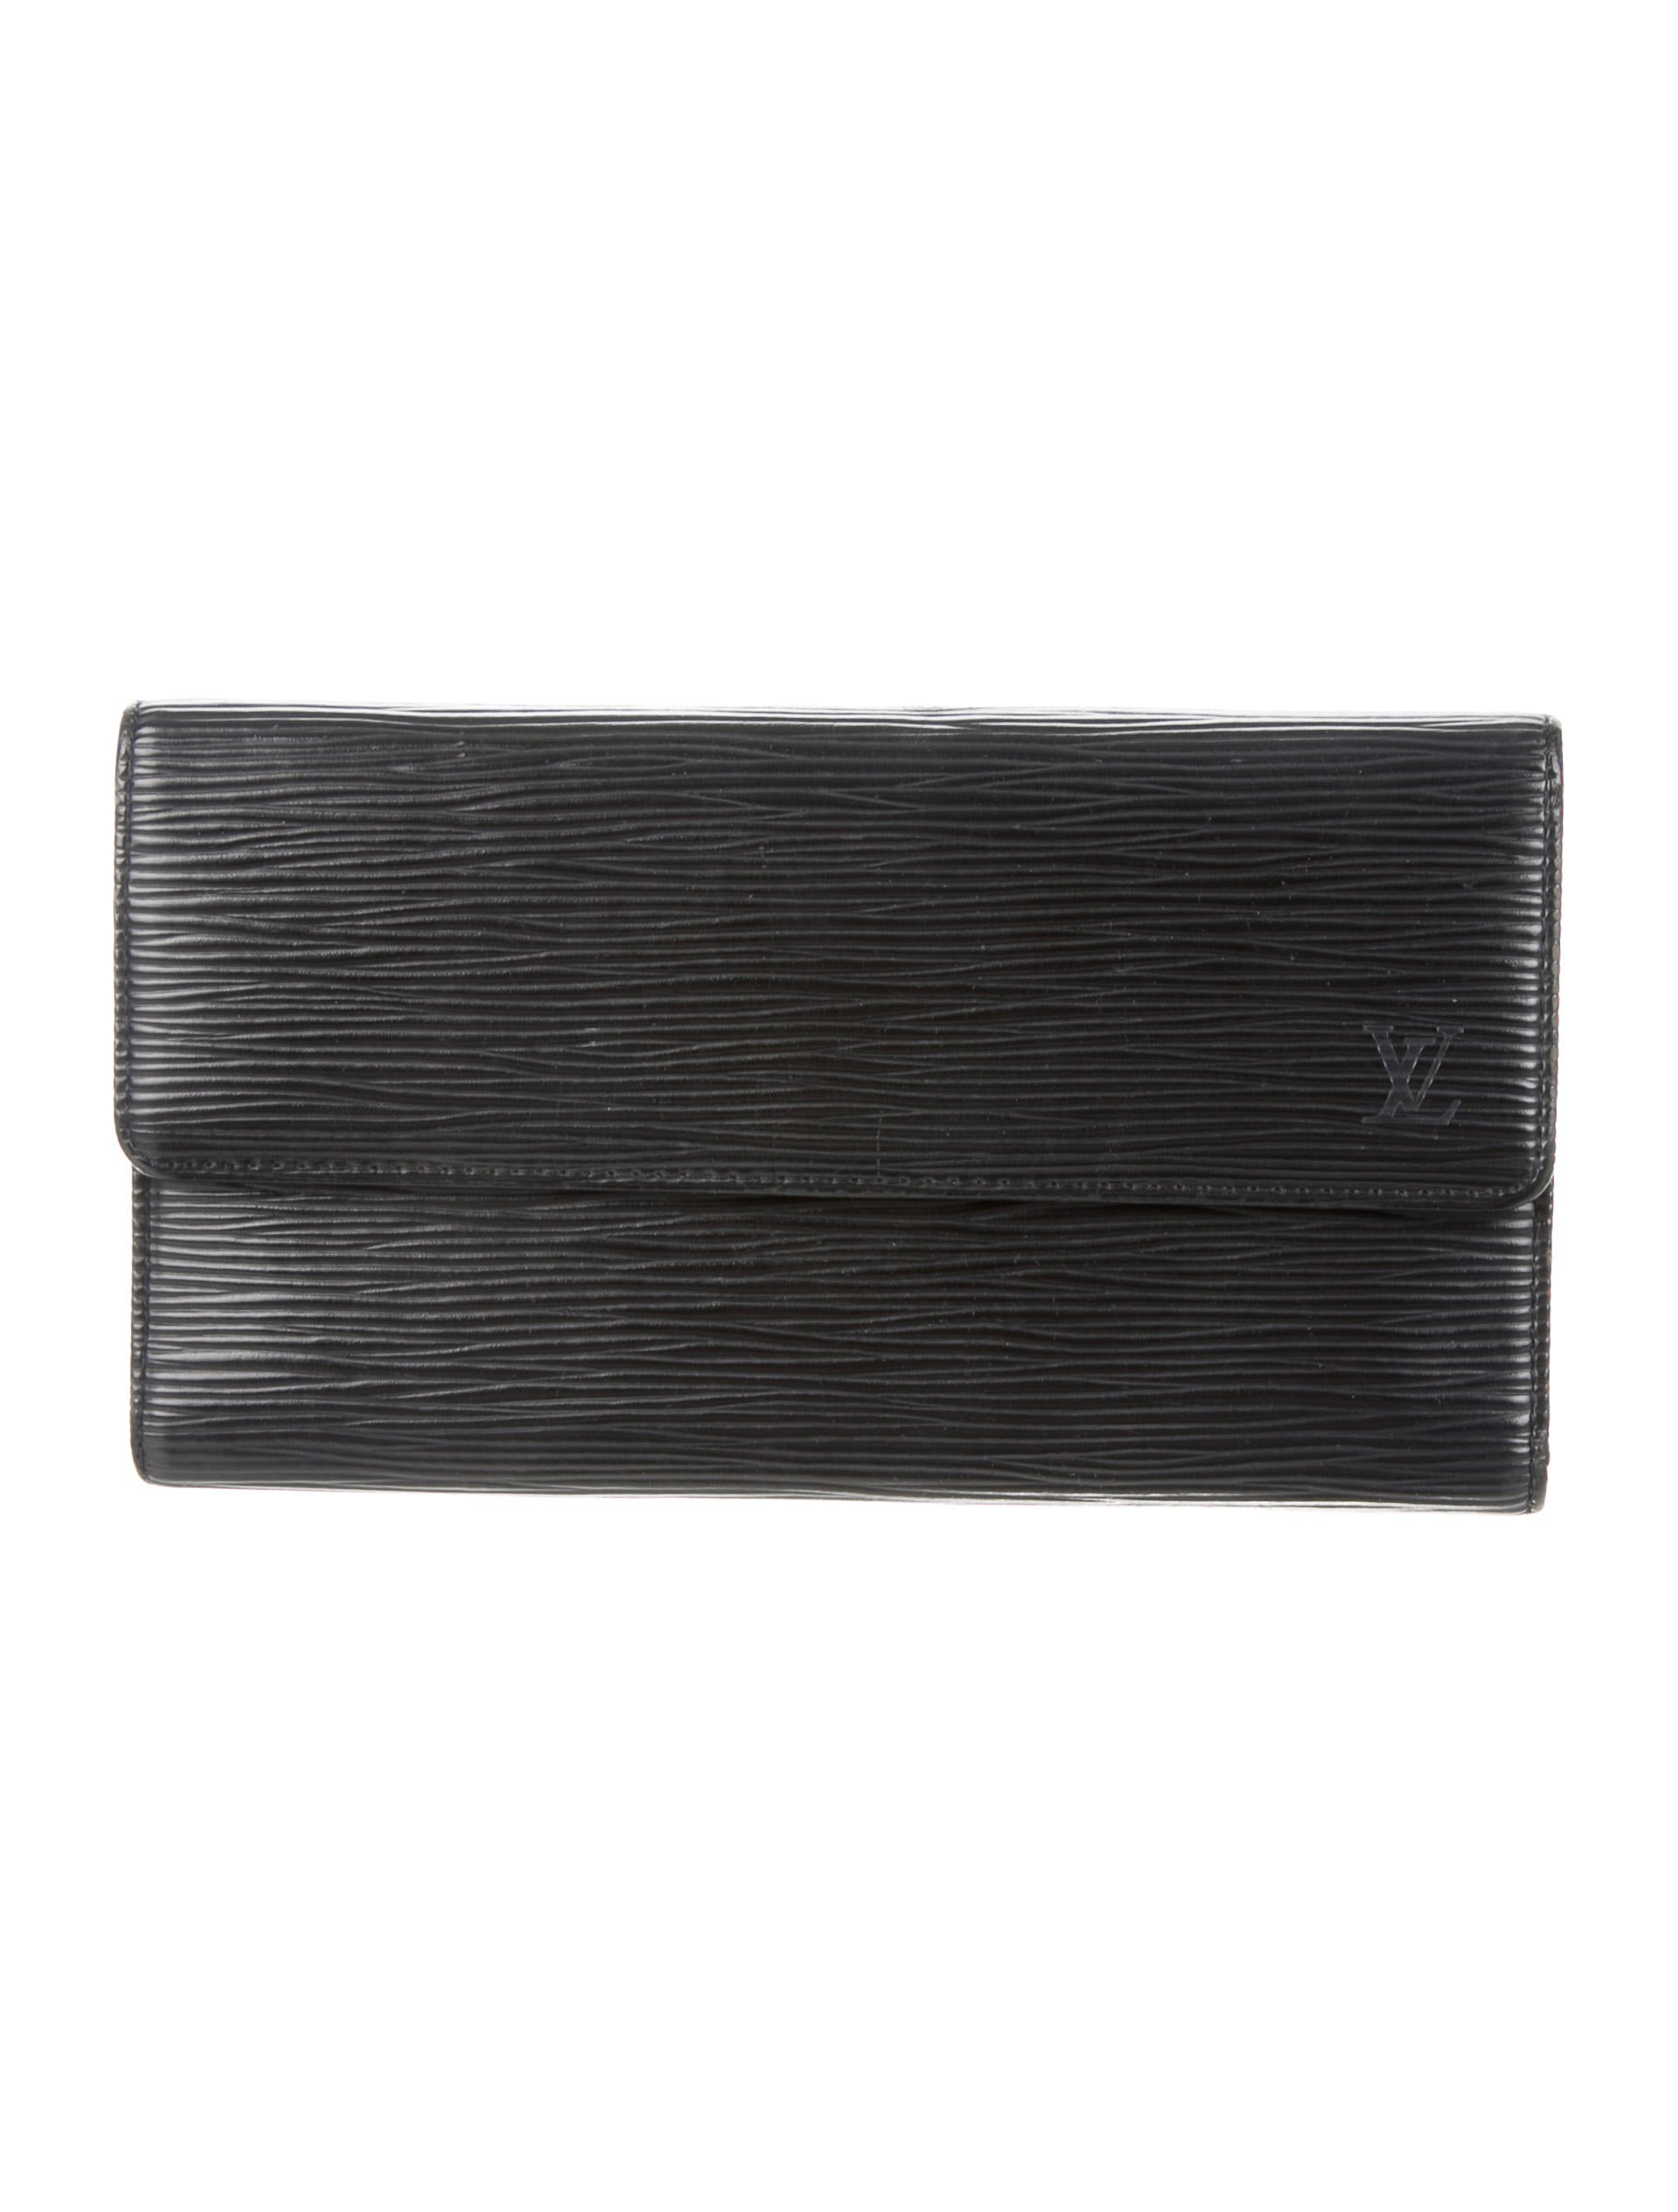 130bfe80e48 Louis Vuitton Epi International Wallet - Accessories - LOU155780 ...